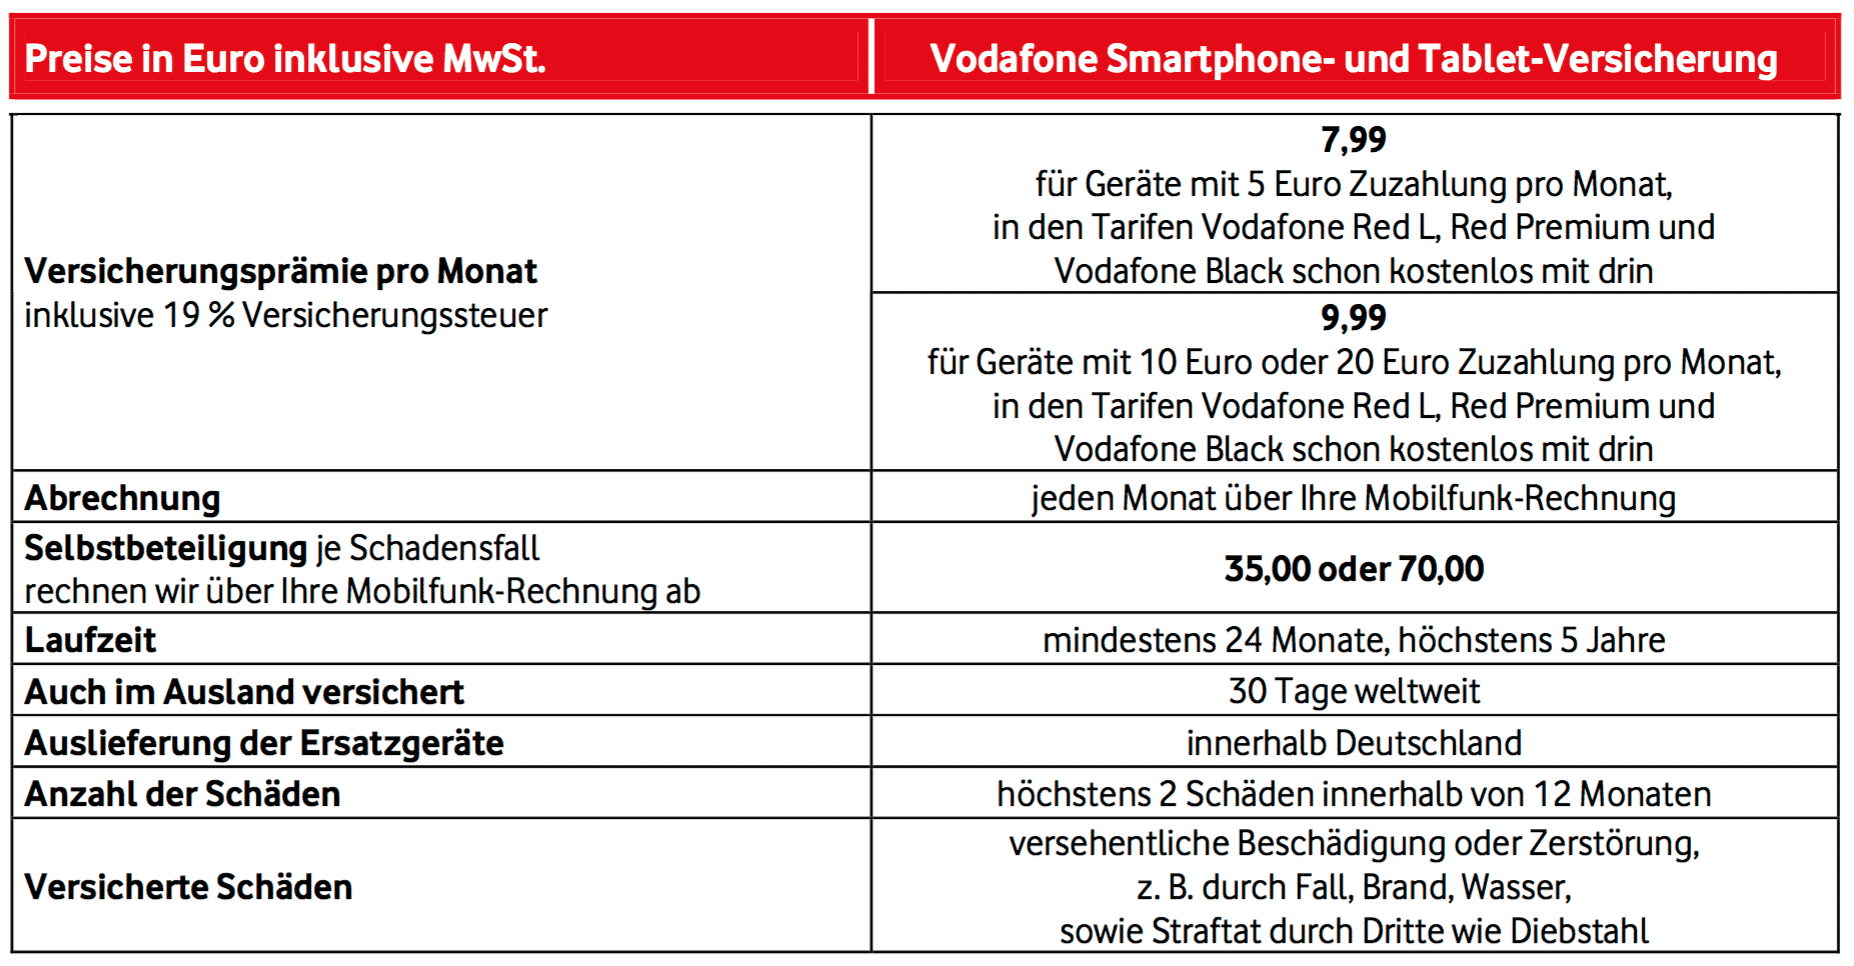 Vodafone Preise